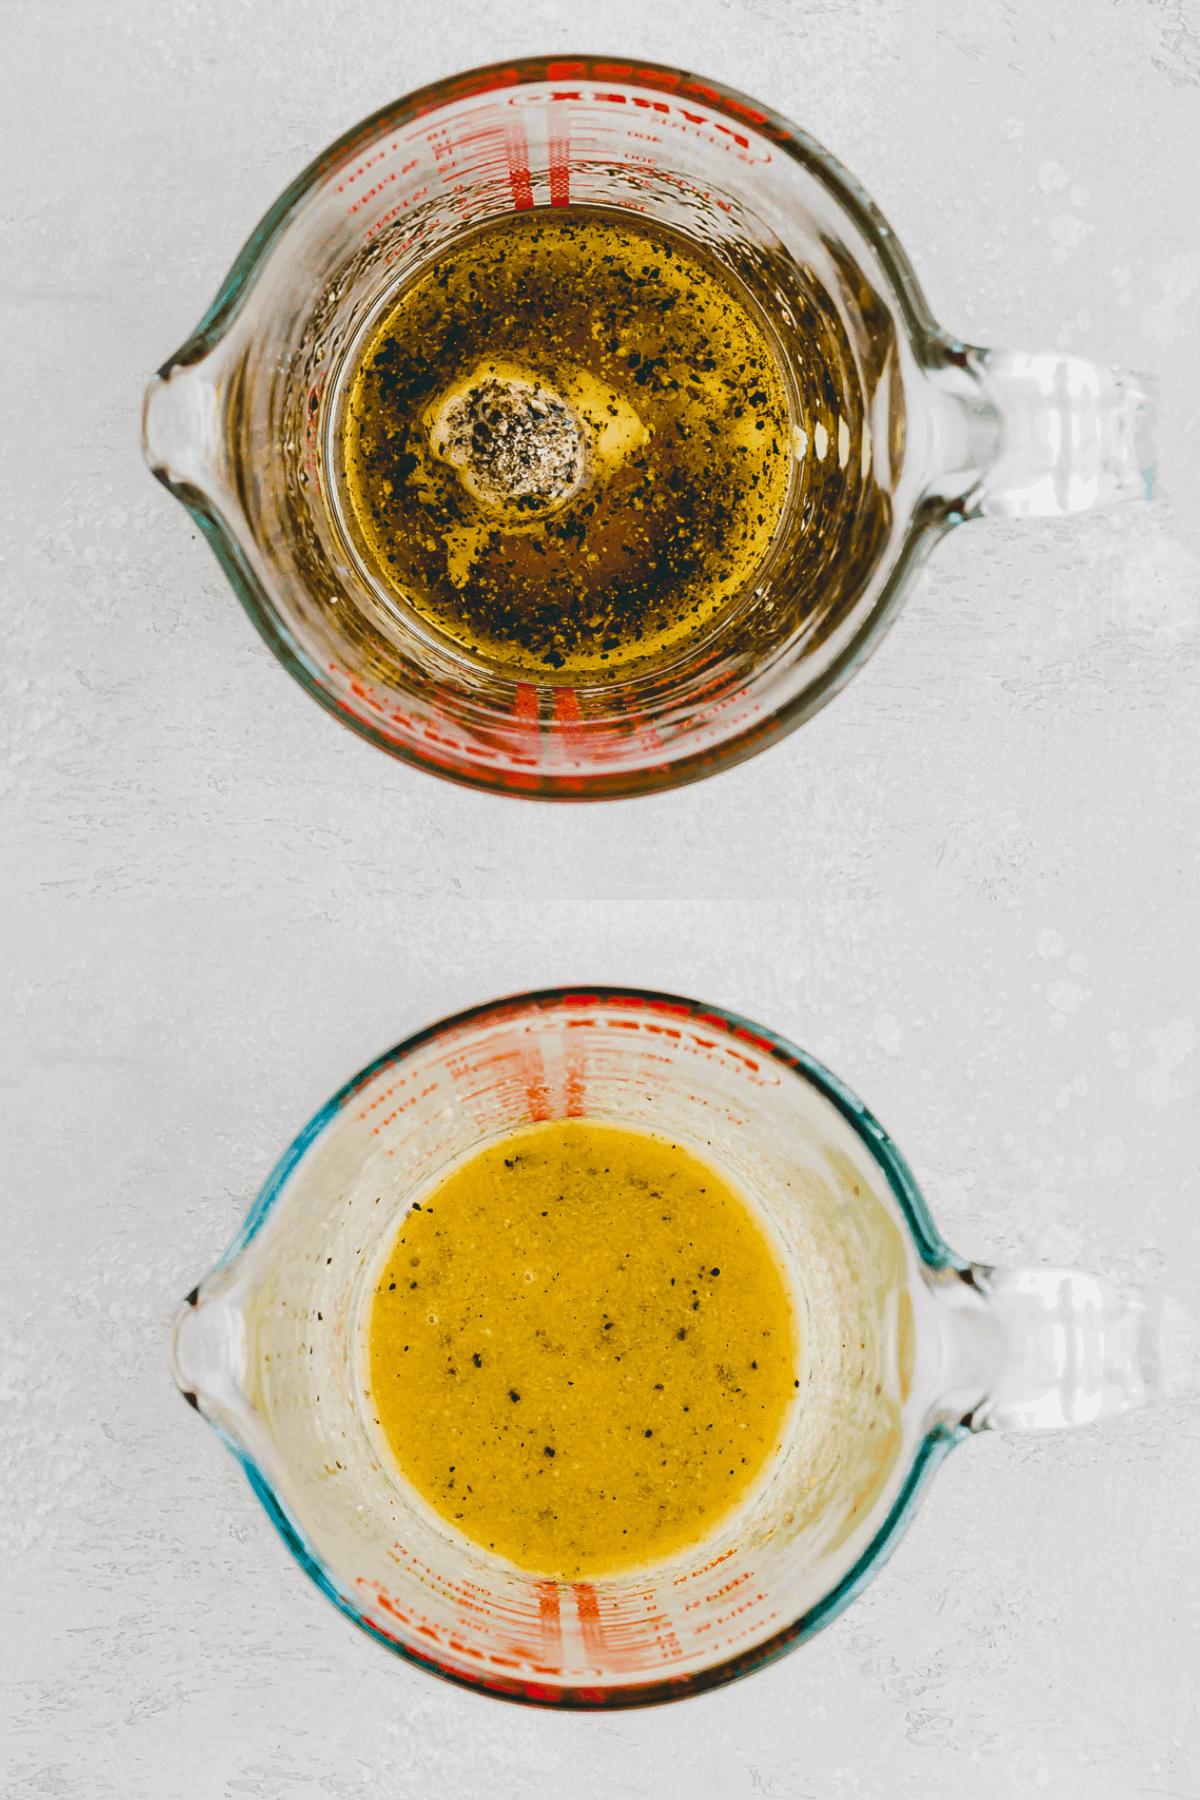 Honig Senf Dressing Rezept Schritt 1-2